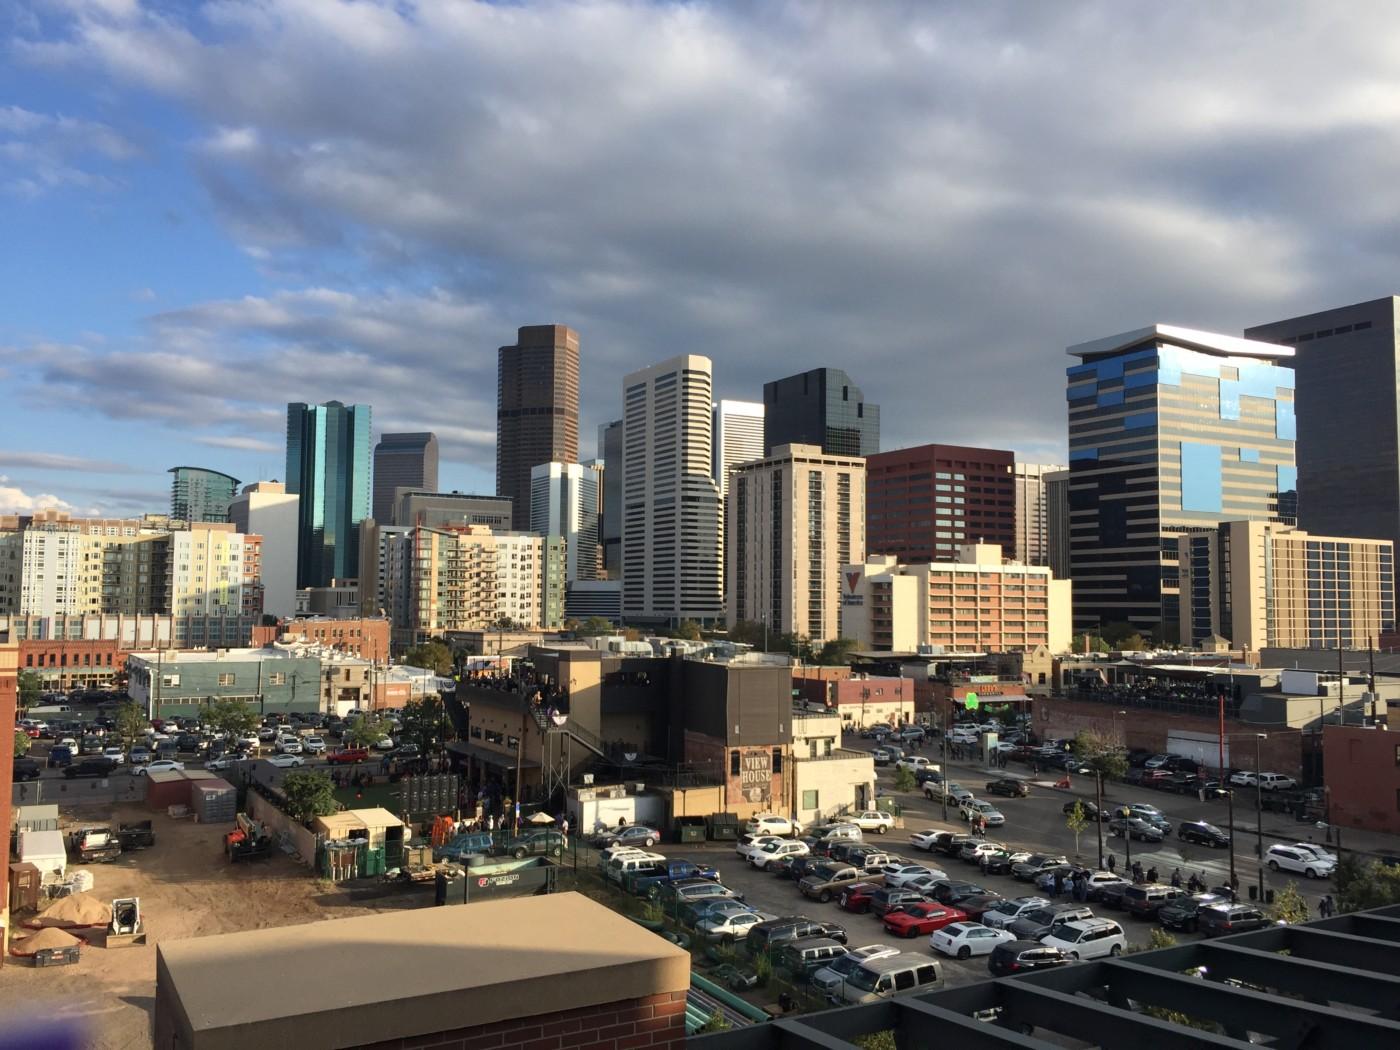 Downtown Denver, Colorado.